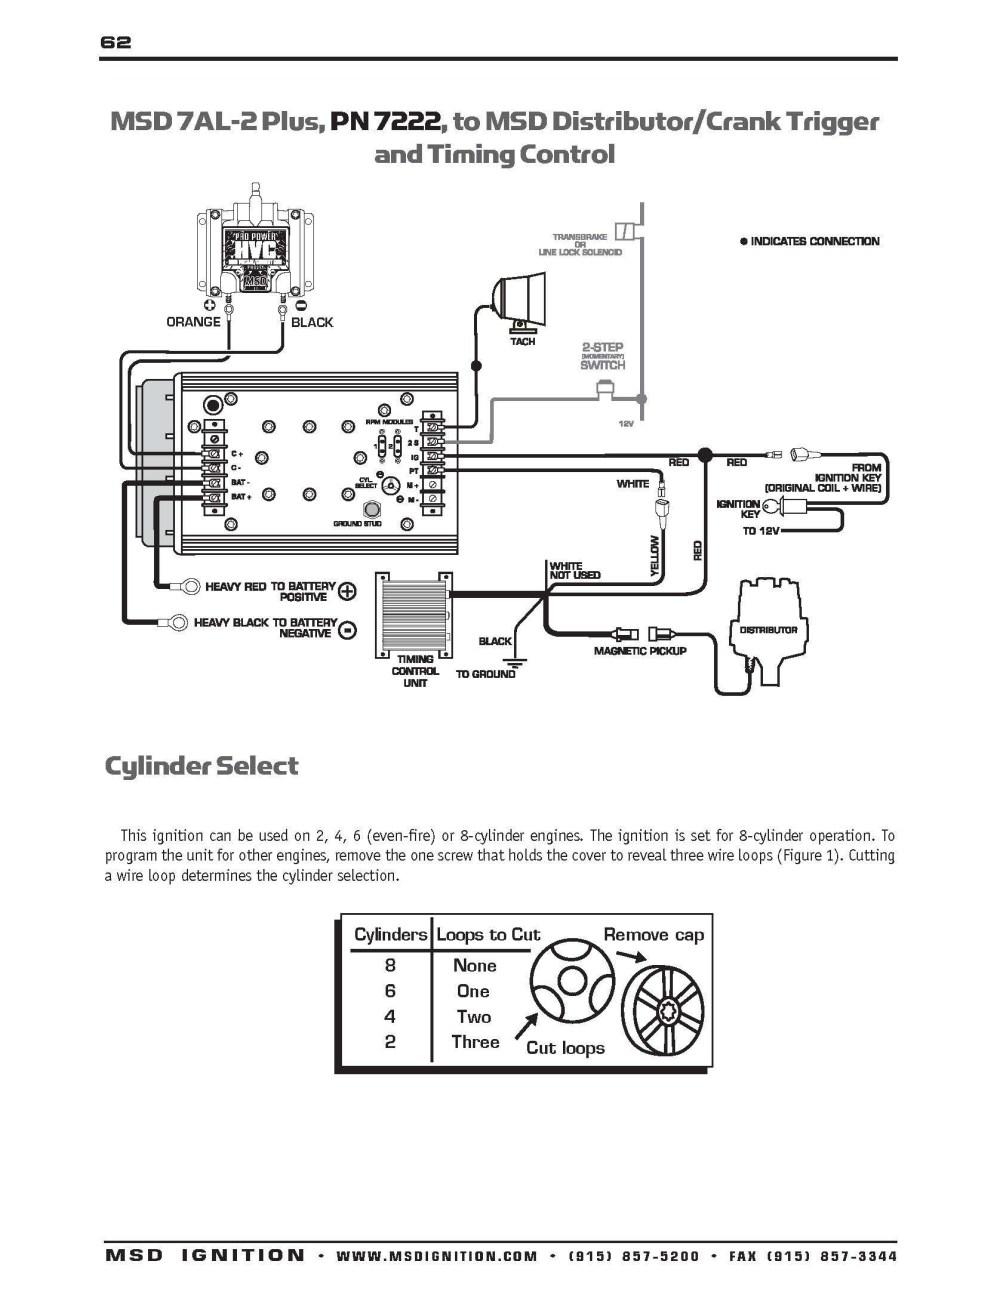 medium resolution of mallory hei distributor wiring diagram wiring diagrams femallory wiring diagram 351 iovegzgv newtrading info